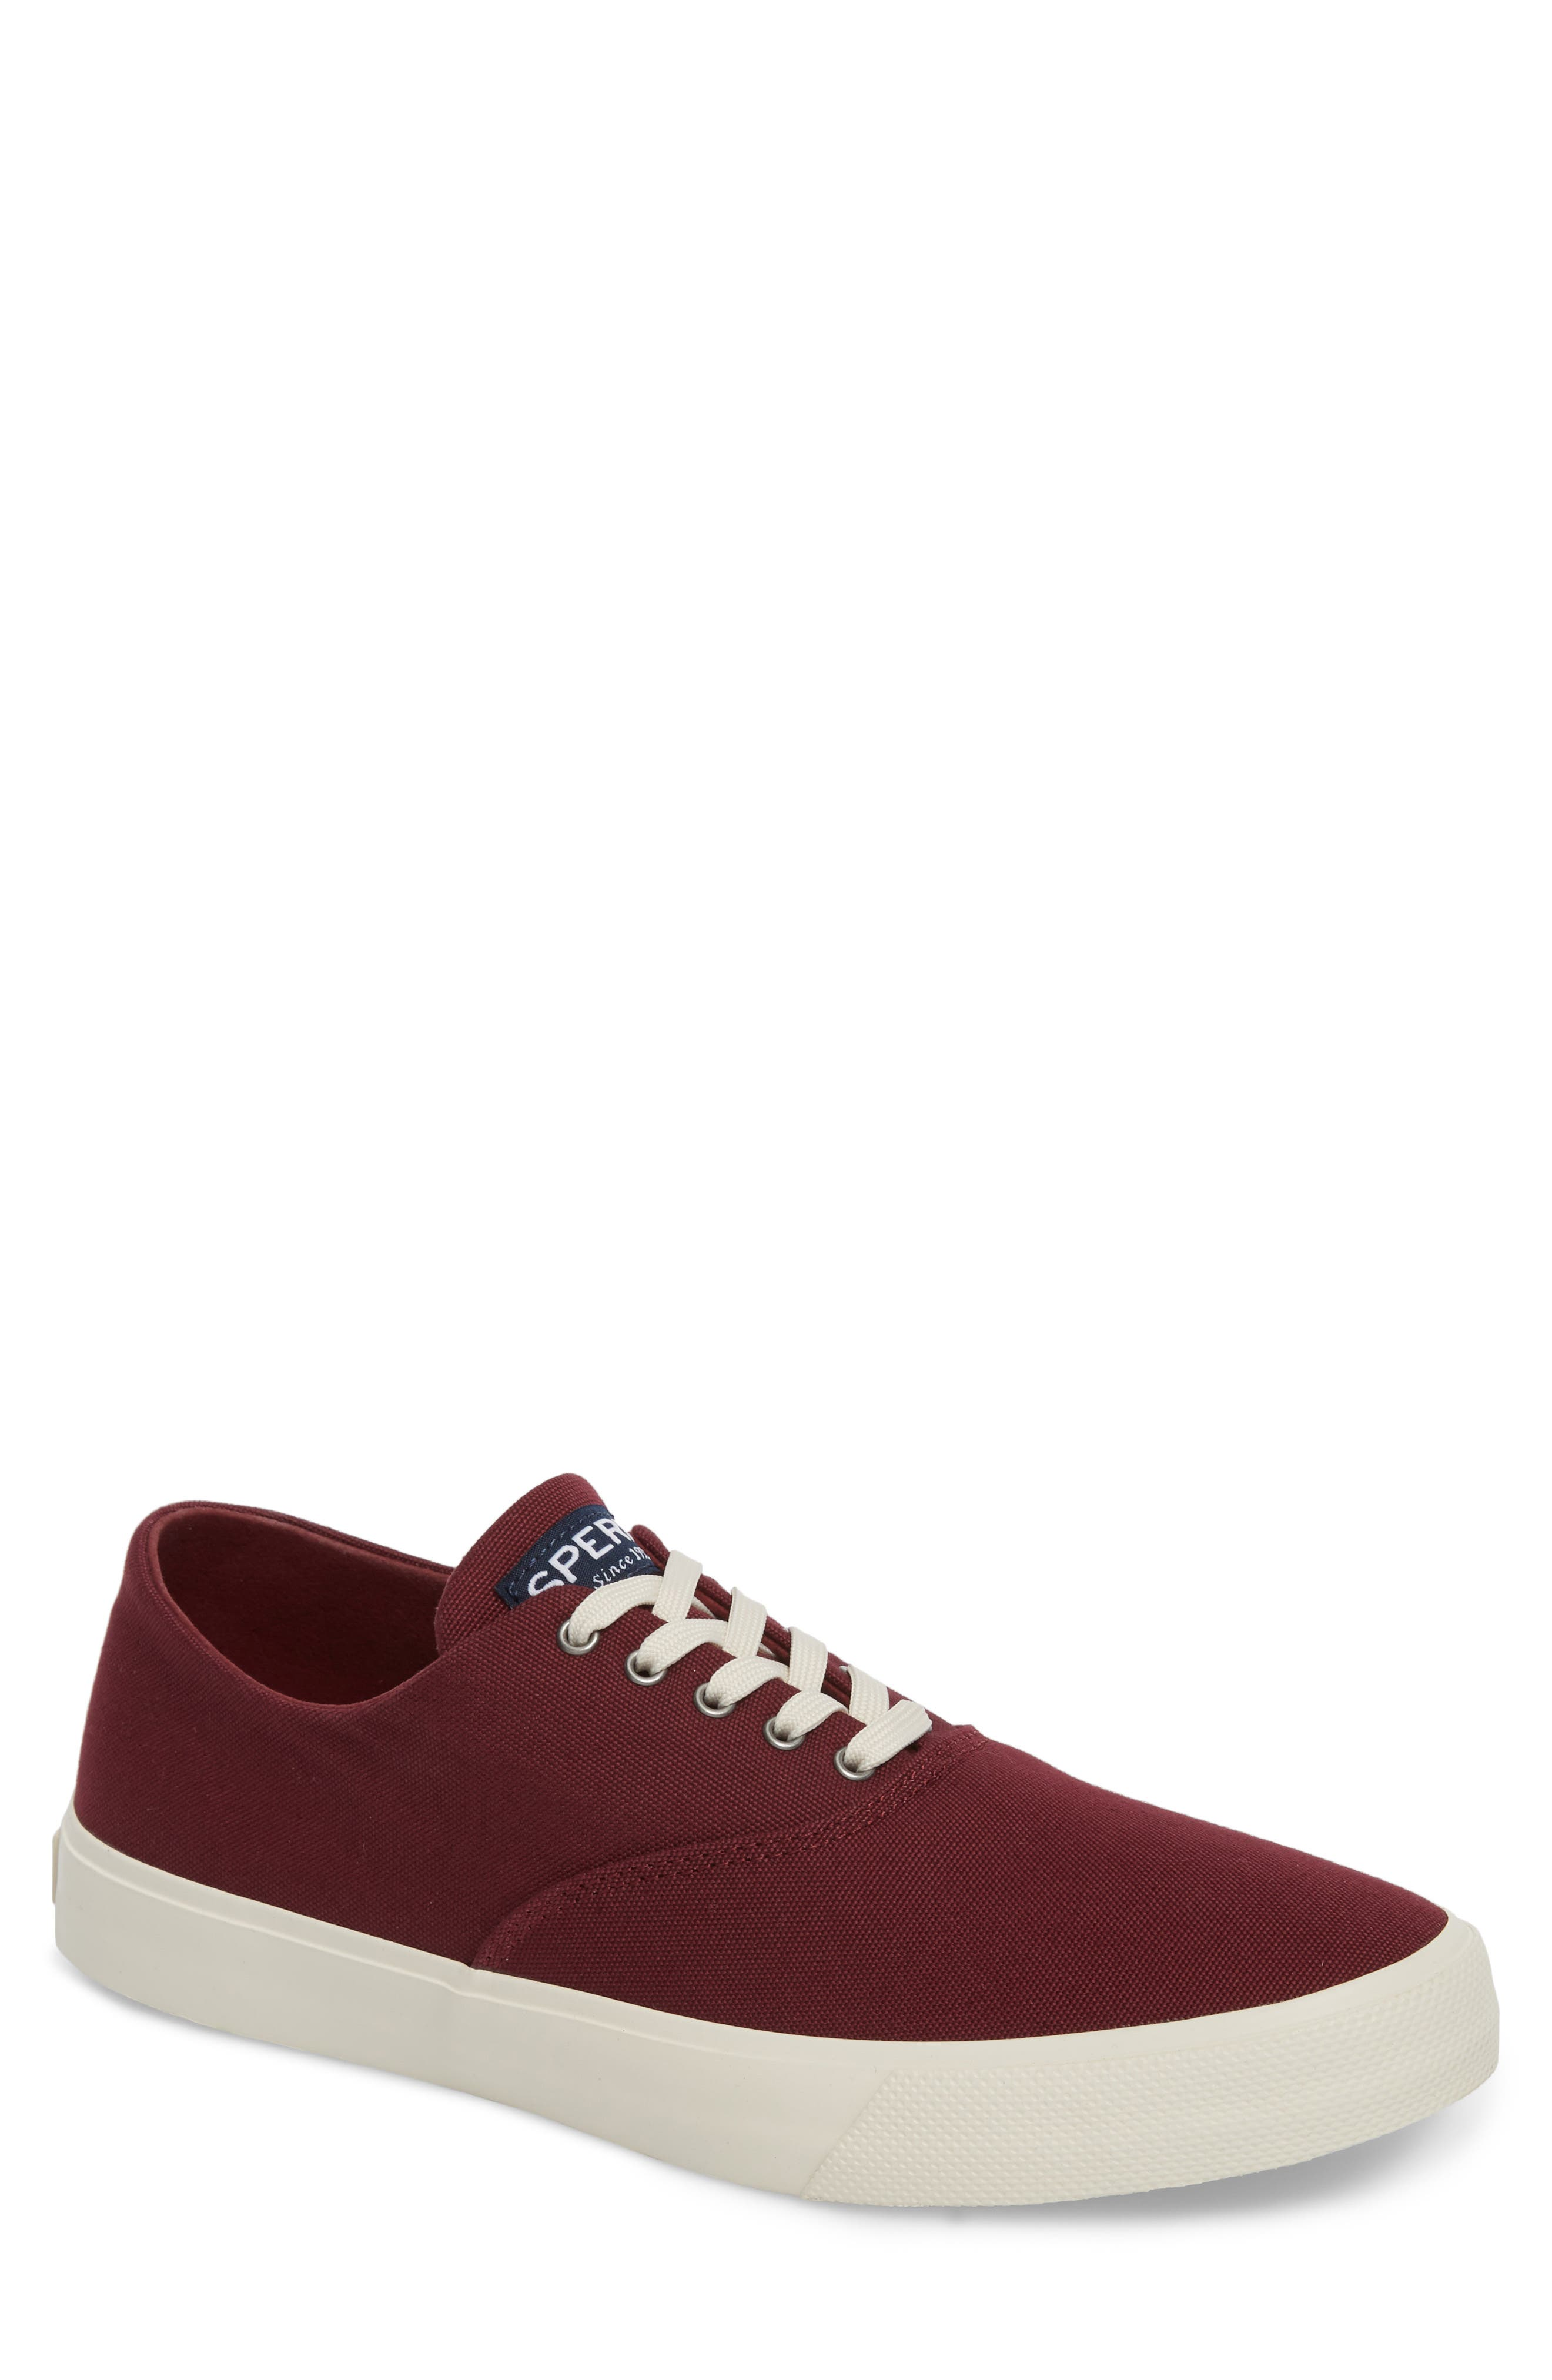 Captain's CVO Sneaker,                             Main thumbnail 1, color,                             WINE FABRIC